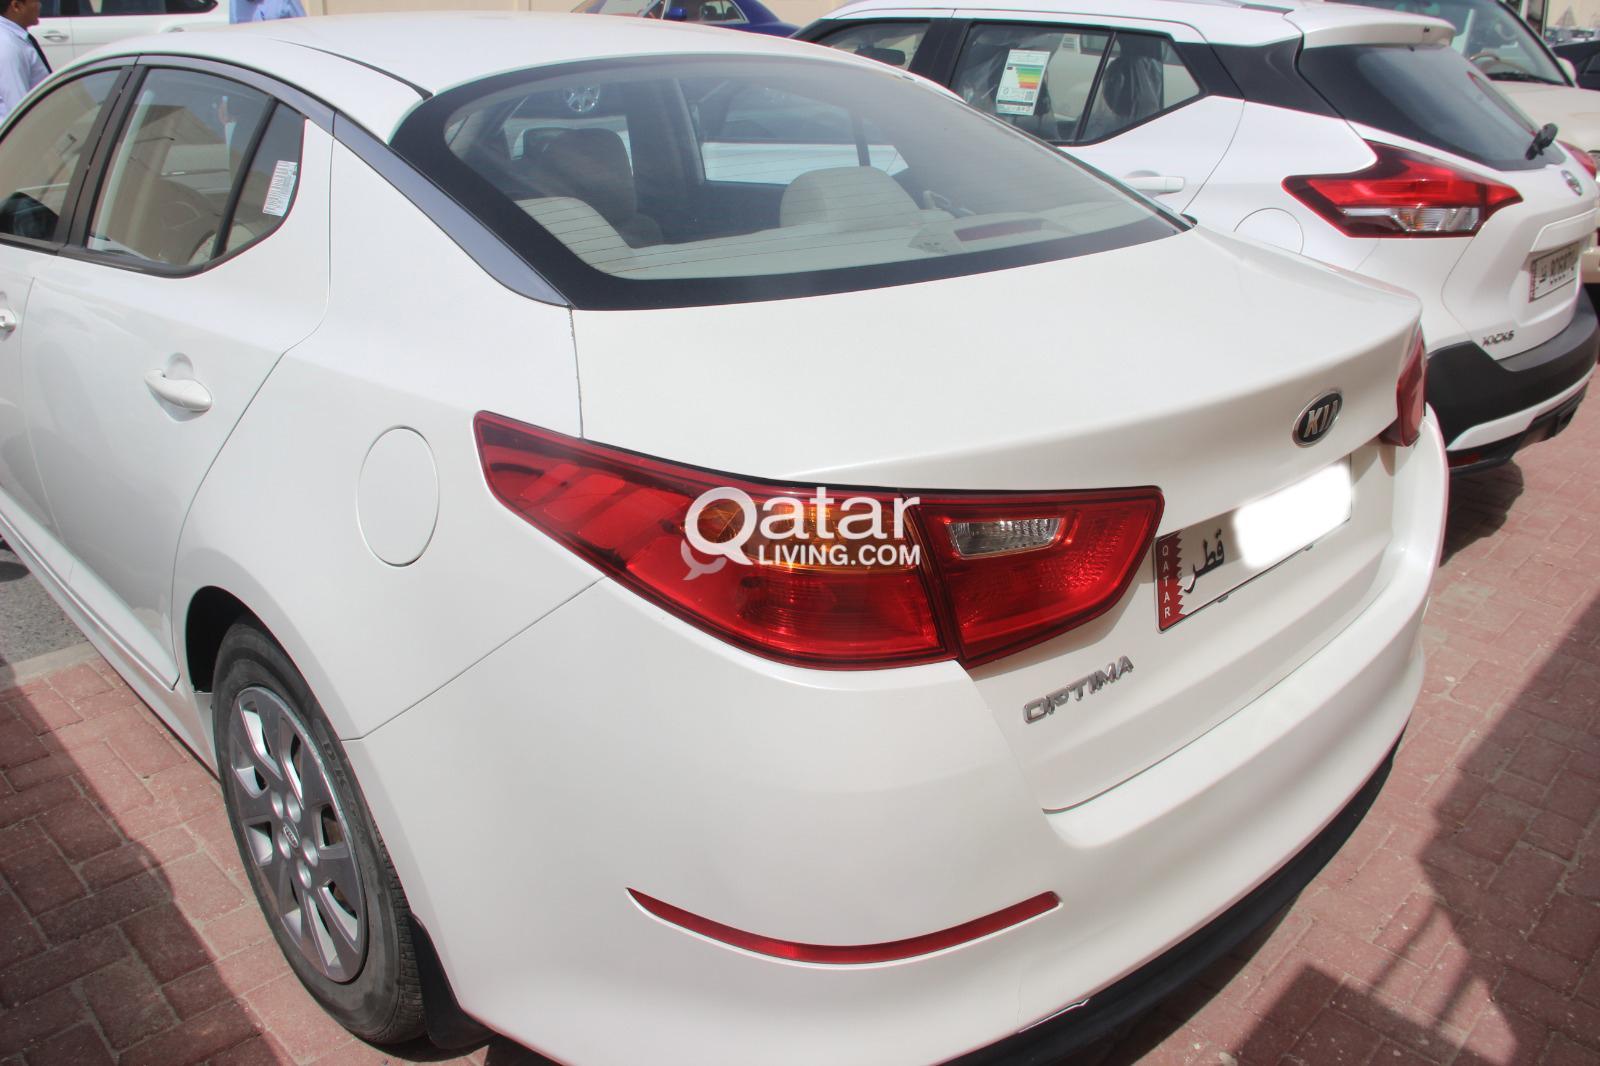 Kia Optima Daily 105 QR - Monthly 1500QR